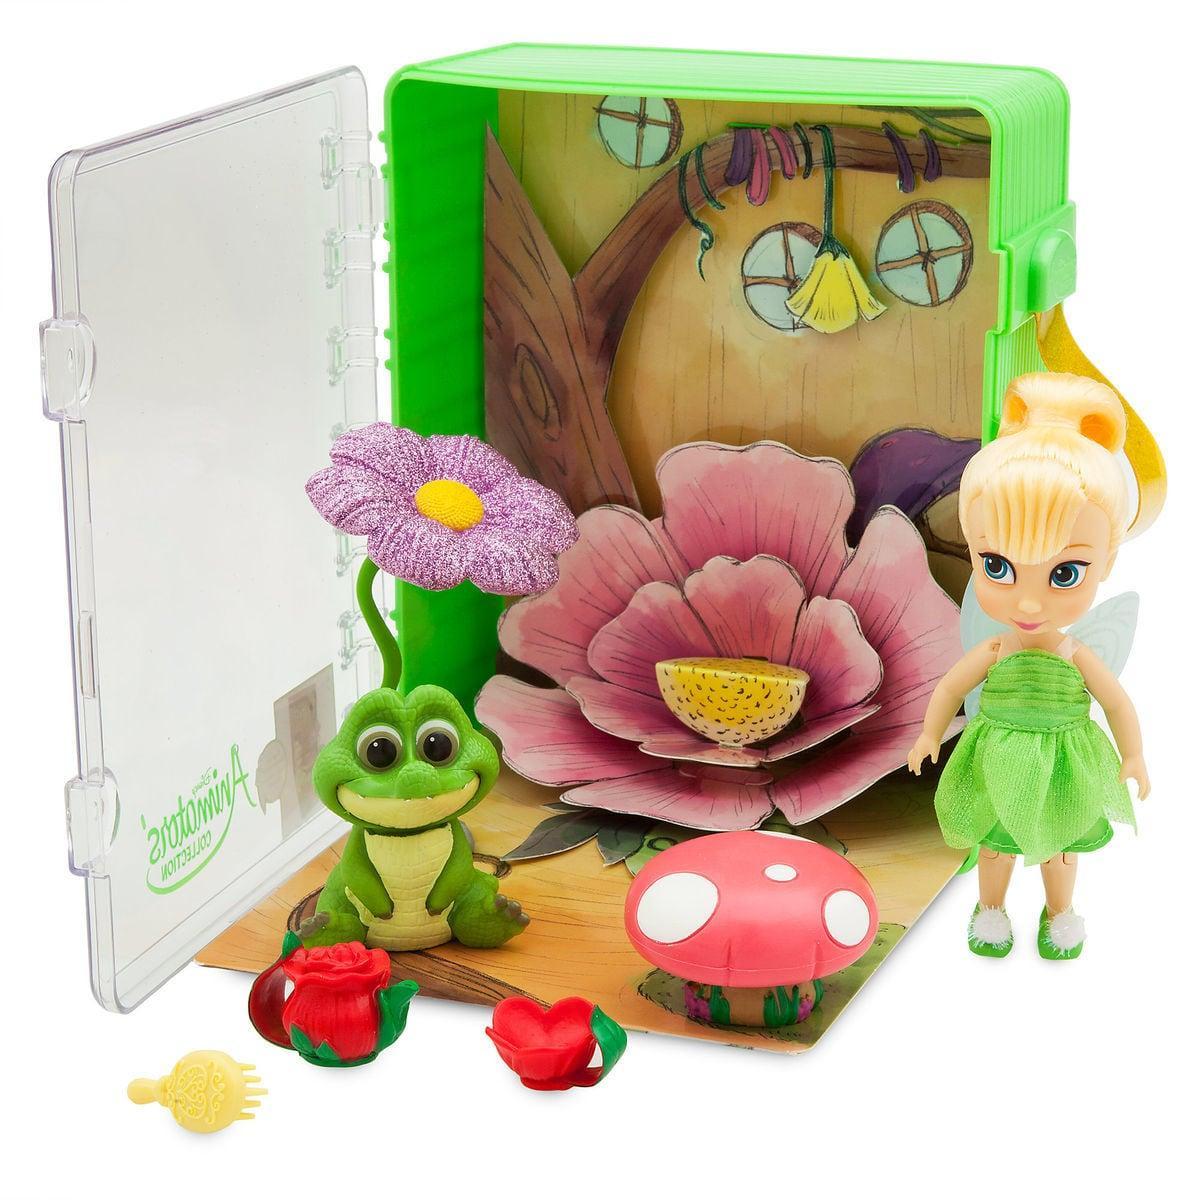 Disney animators мини аниматоры Фея Динь Динь в чемоданчике Tinker Bell collection mini doll play set